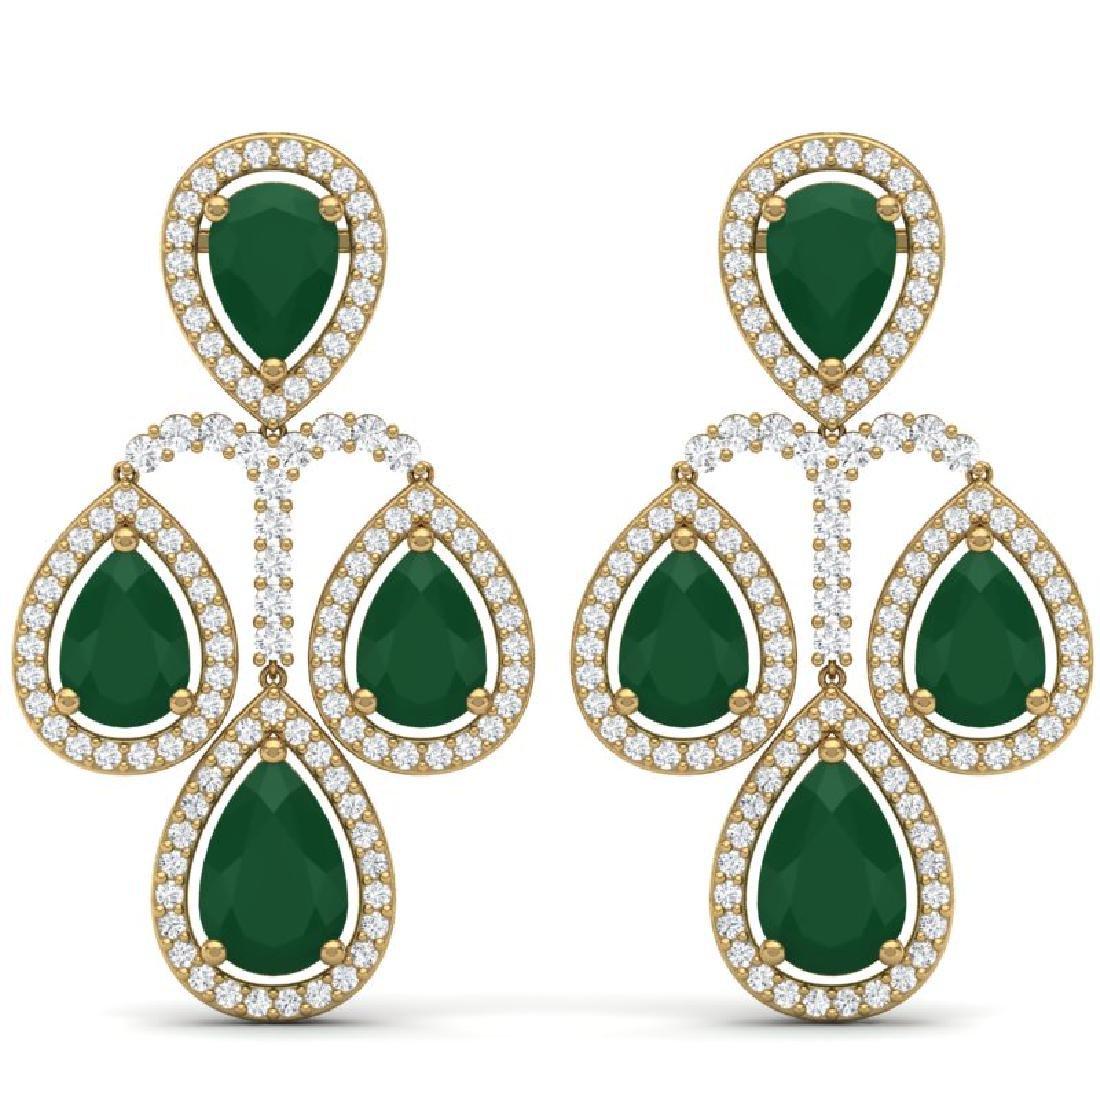 29.23 CTW Royalty Emerald & VS Diamond Earrings 18K